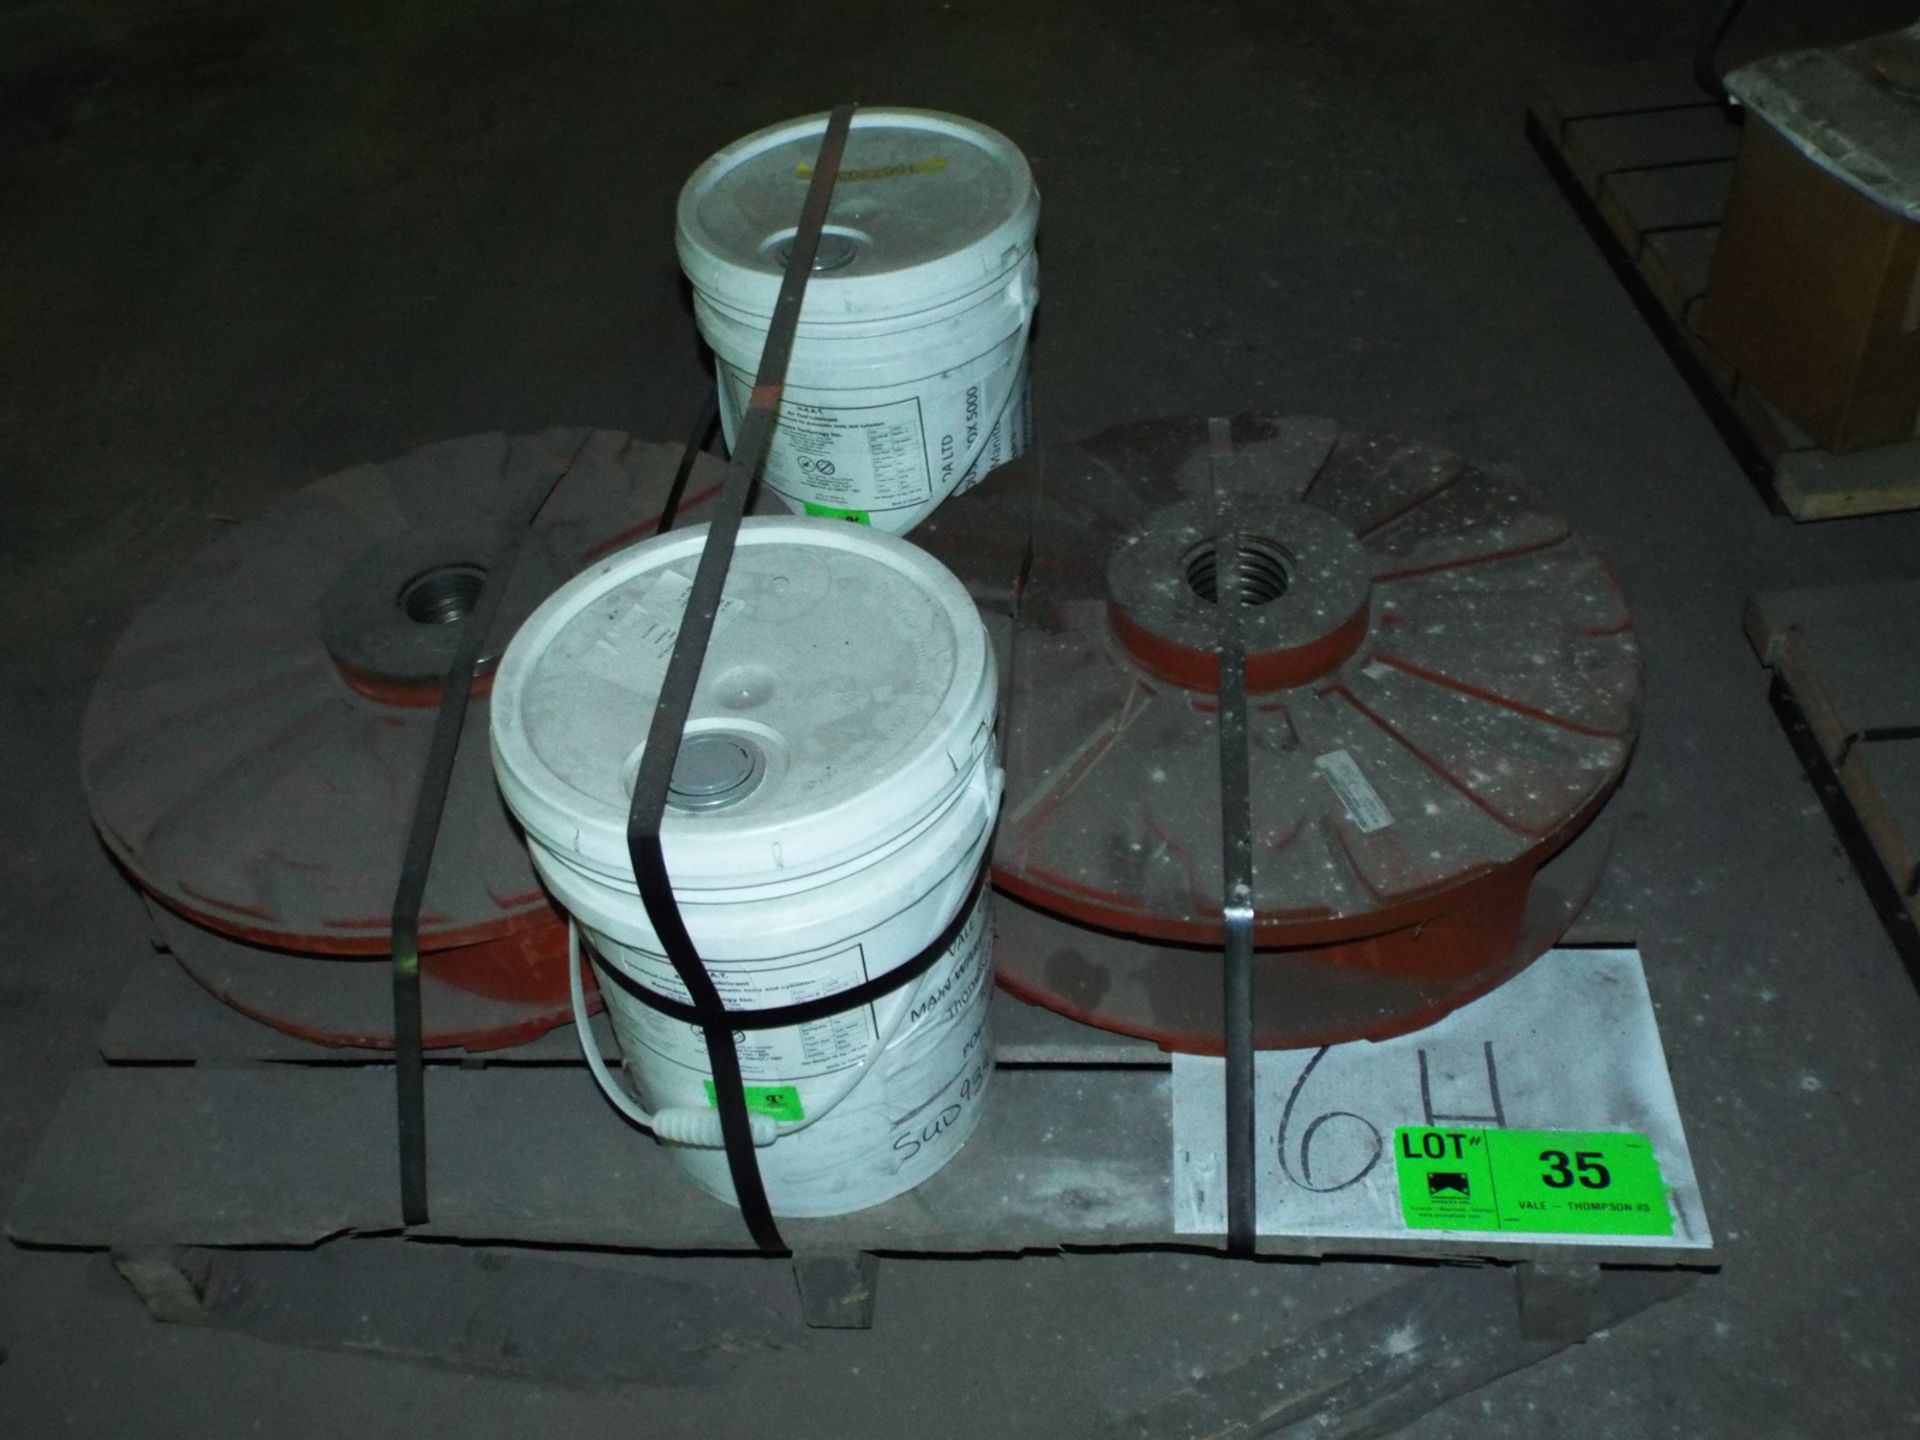 Lot 35 - LOT/ CONTENTS OF SKID - (2) 4 VANE IMPELLER PUMPS, (2) 20L PAILS HHAT AIR TOOL LUBRICANT (PLT 6H)